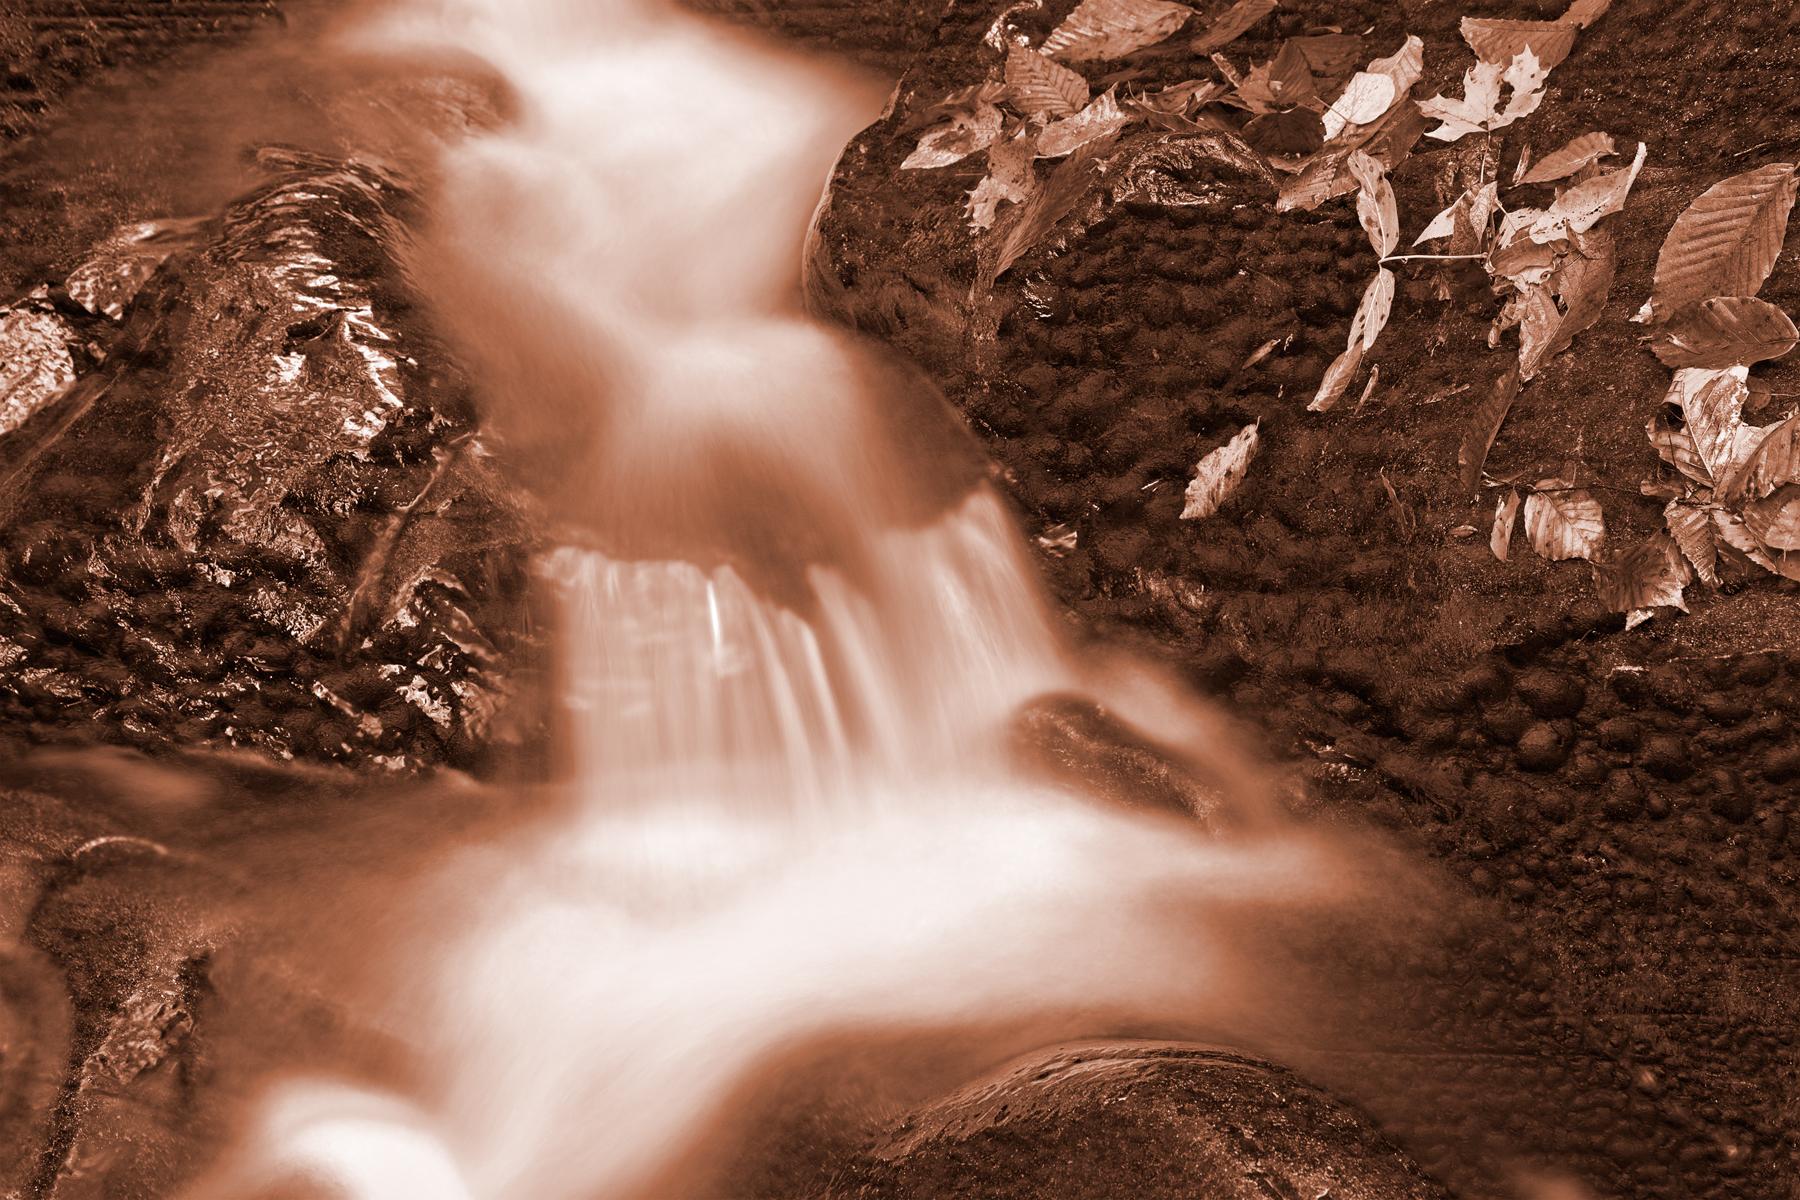 Chocolate Fantasy Stream, Abstract, Patapsco, Serenity, Serene, HQ Photo